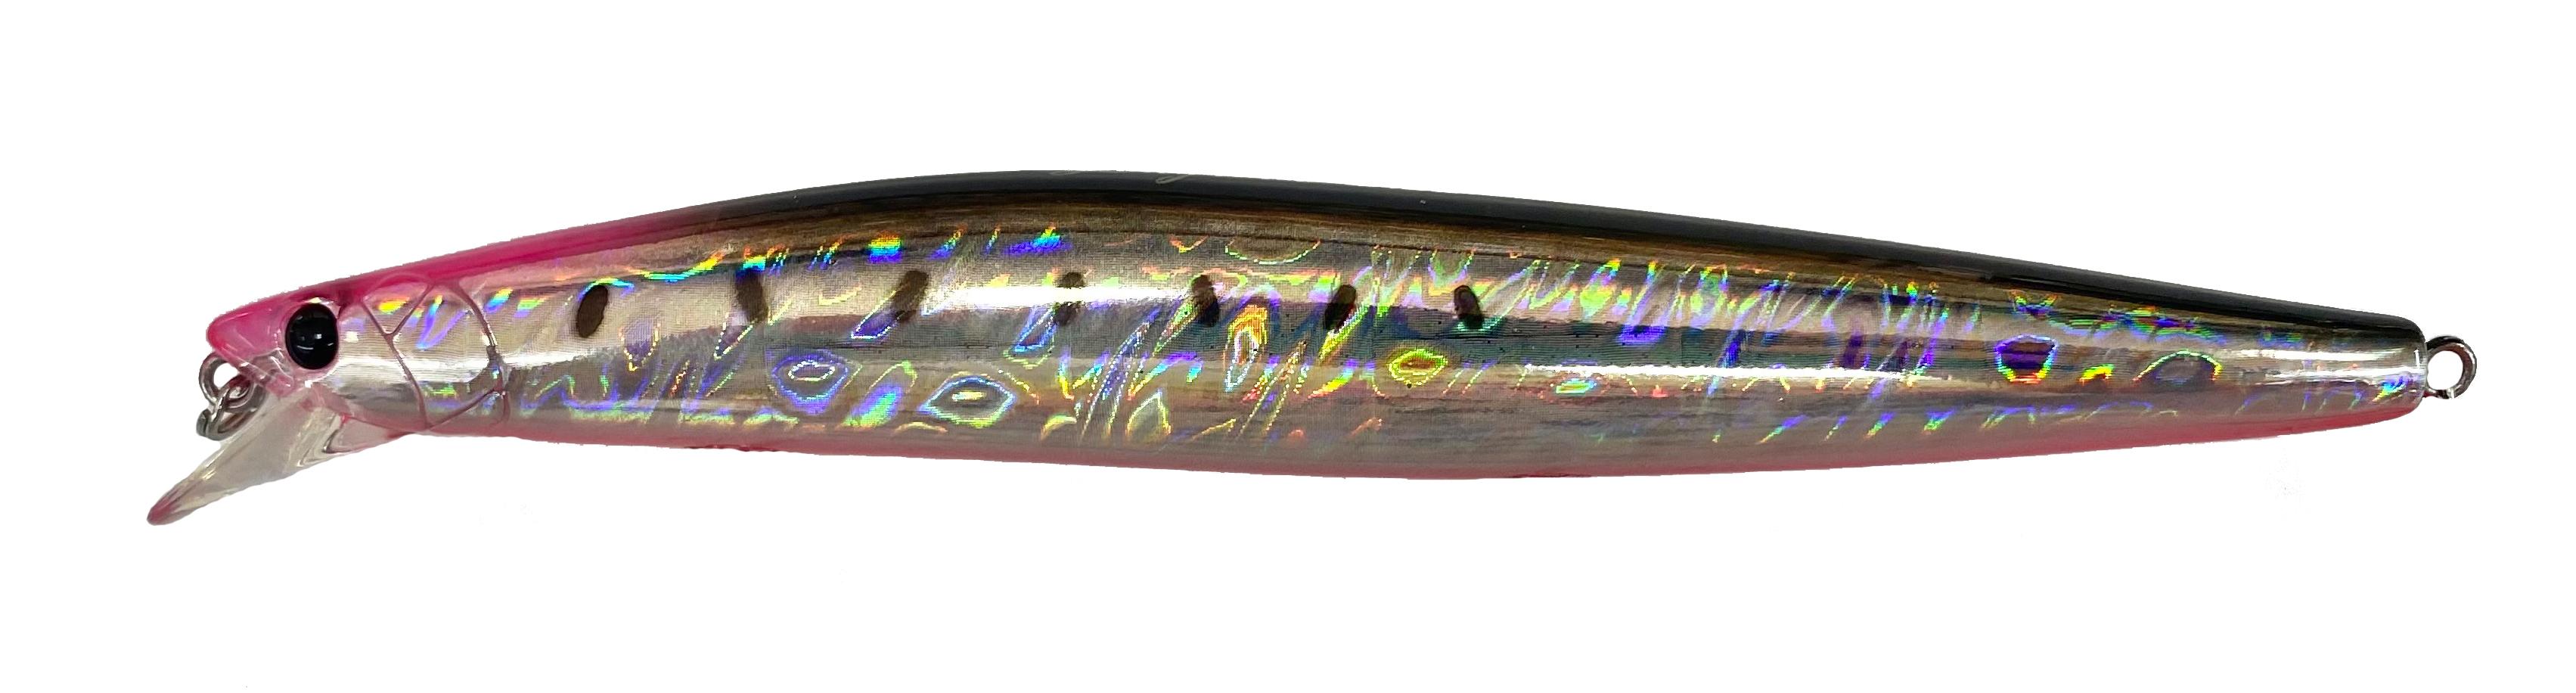 Tsurinoya lenguado 140mm 23g sinking minnow-A